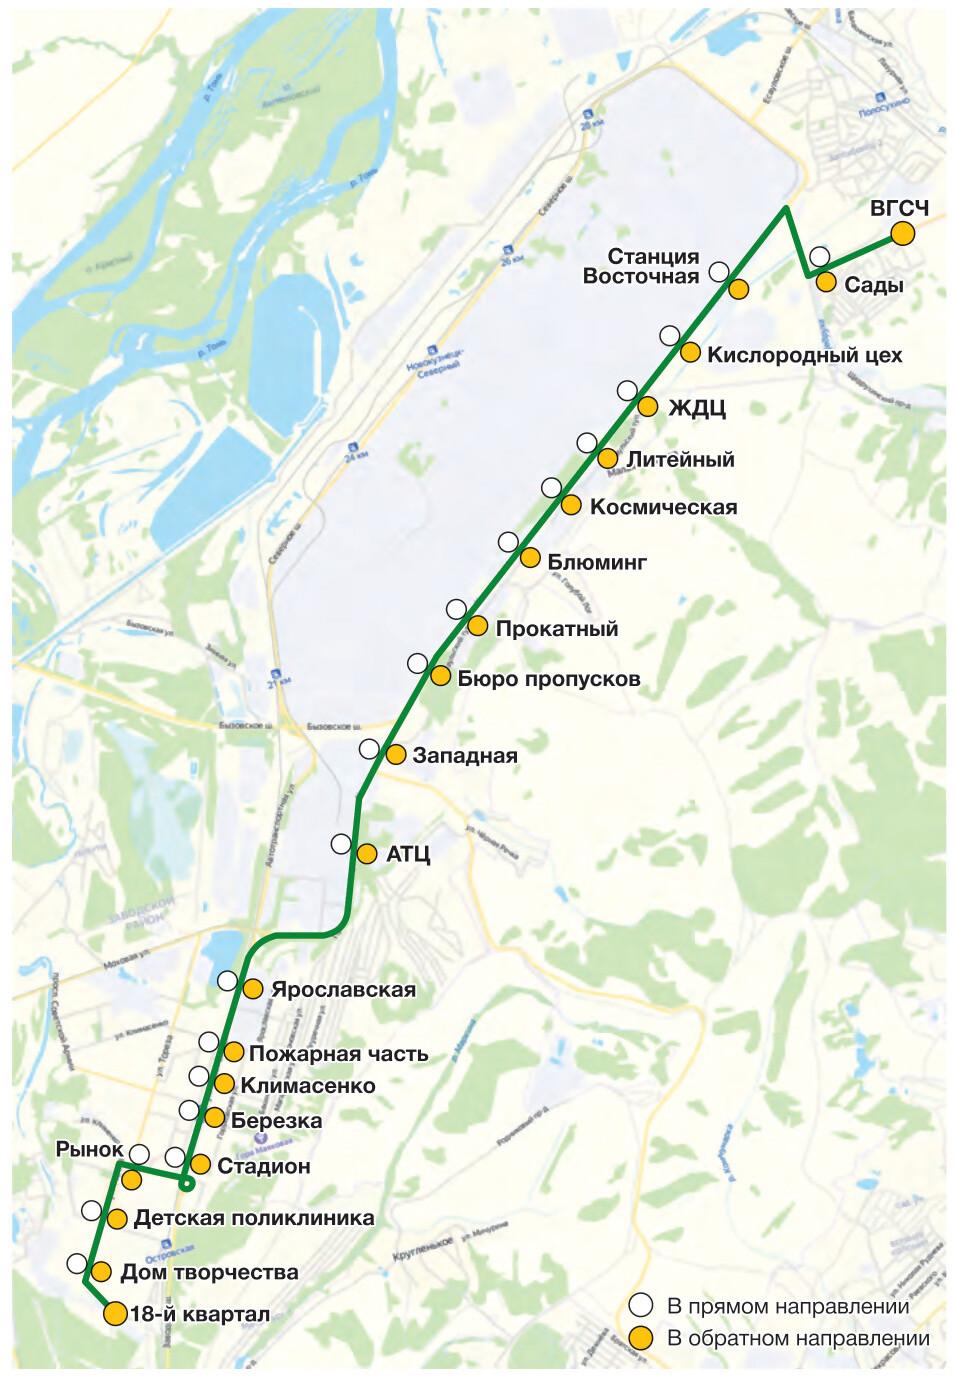 Автобус №24 ВГСЧ - ДОМ ТВОРЧЕСТВА | Карта маршрута